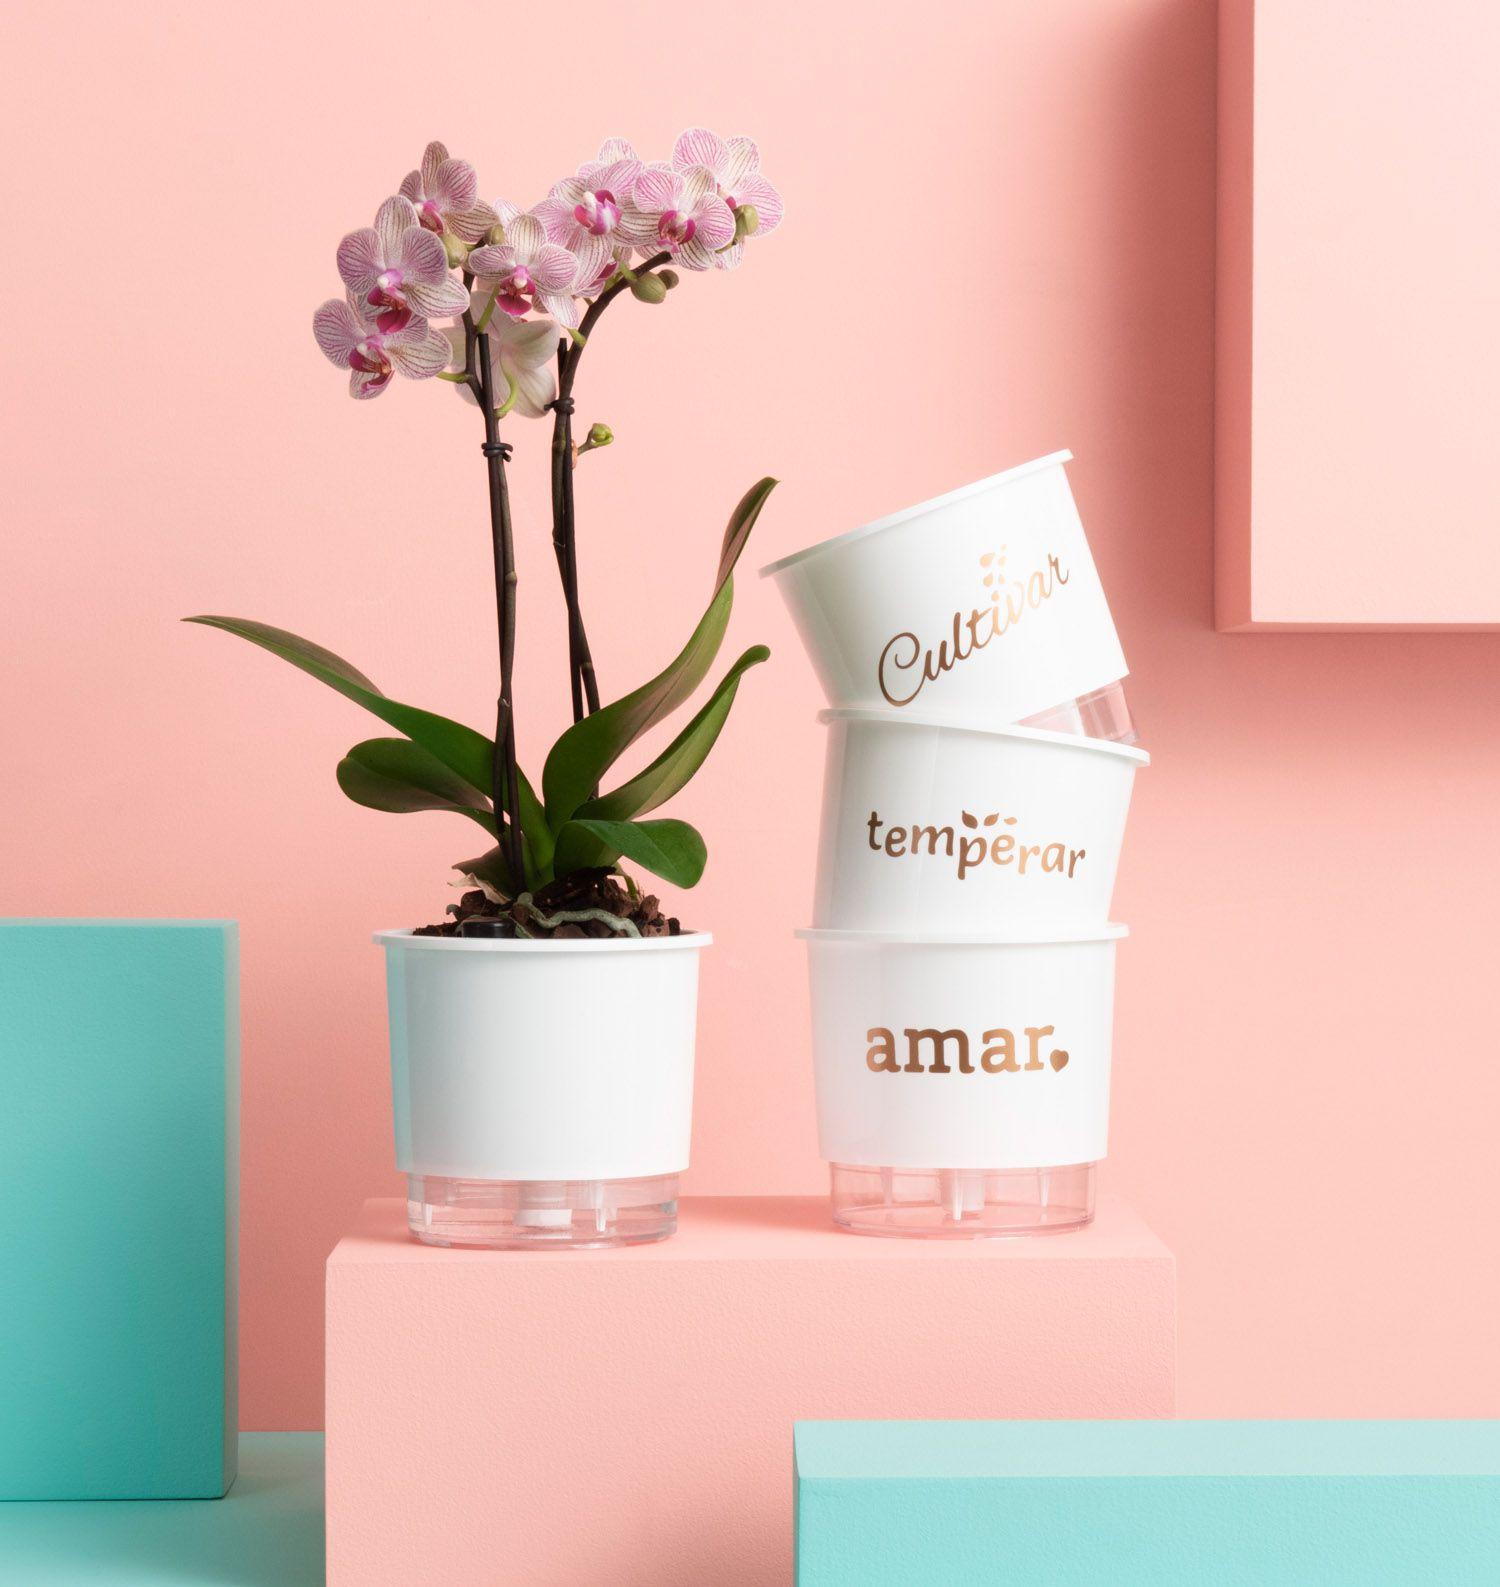 Kit 3 Vasos Autoirrigáveis Pequenos N02 12cm x 11cm Cultivar Temperar e Amar Branco